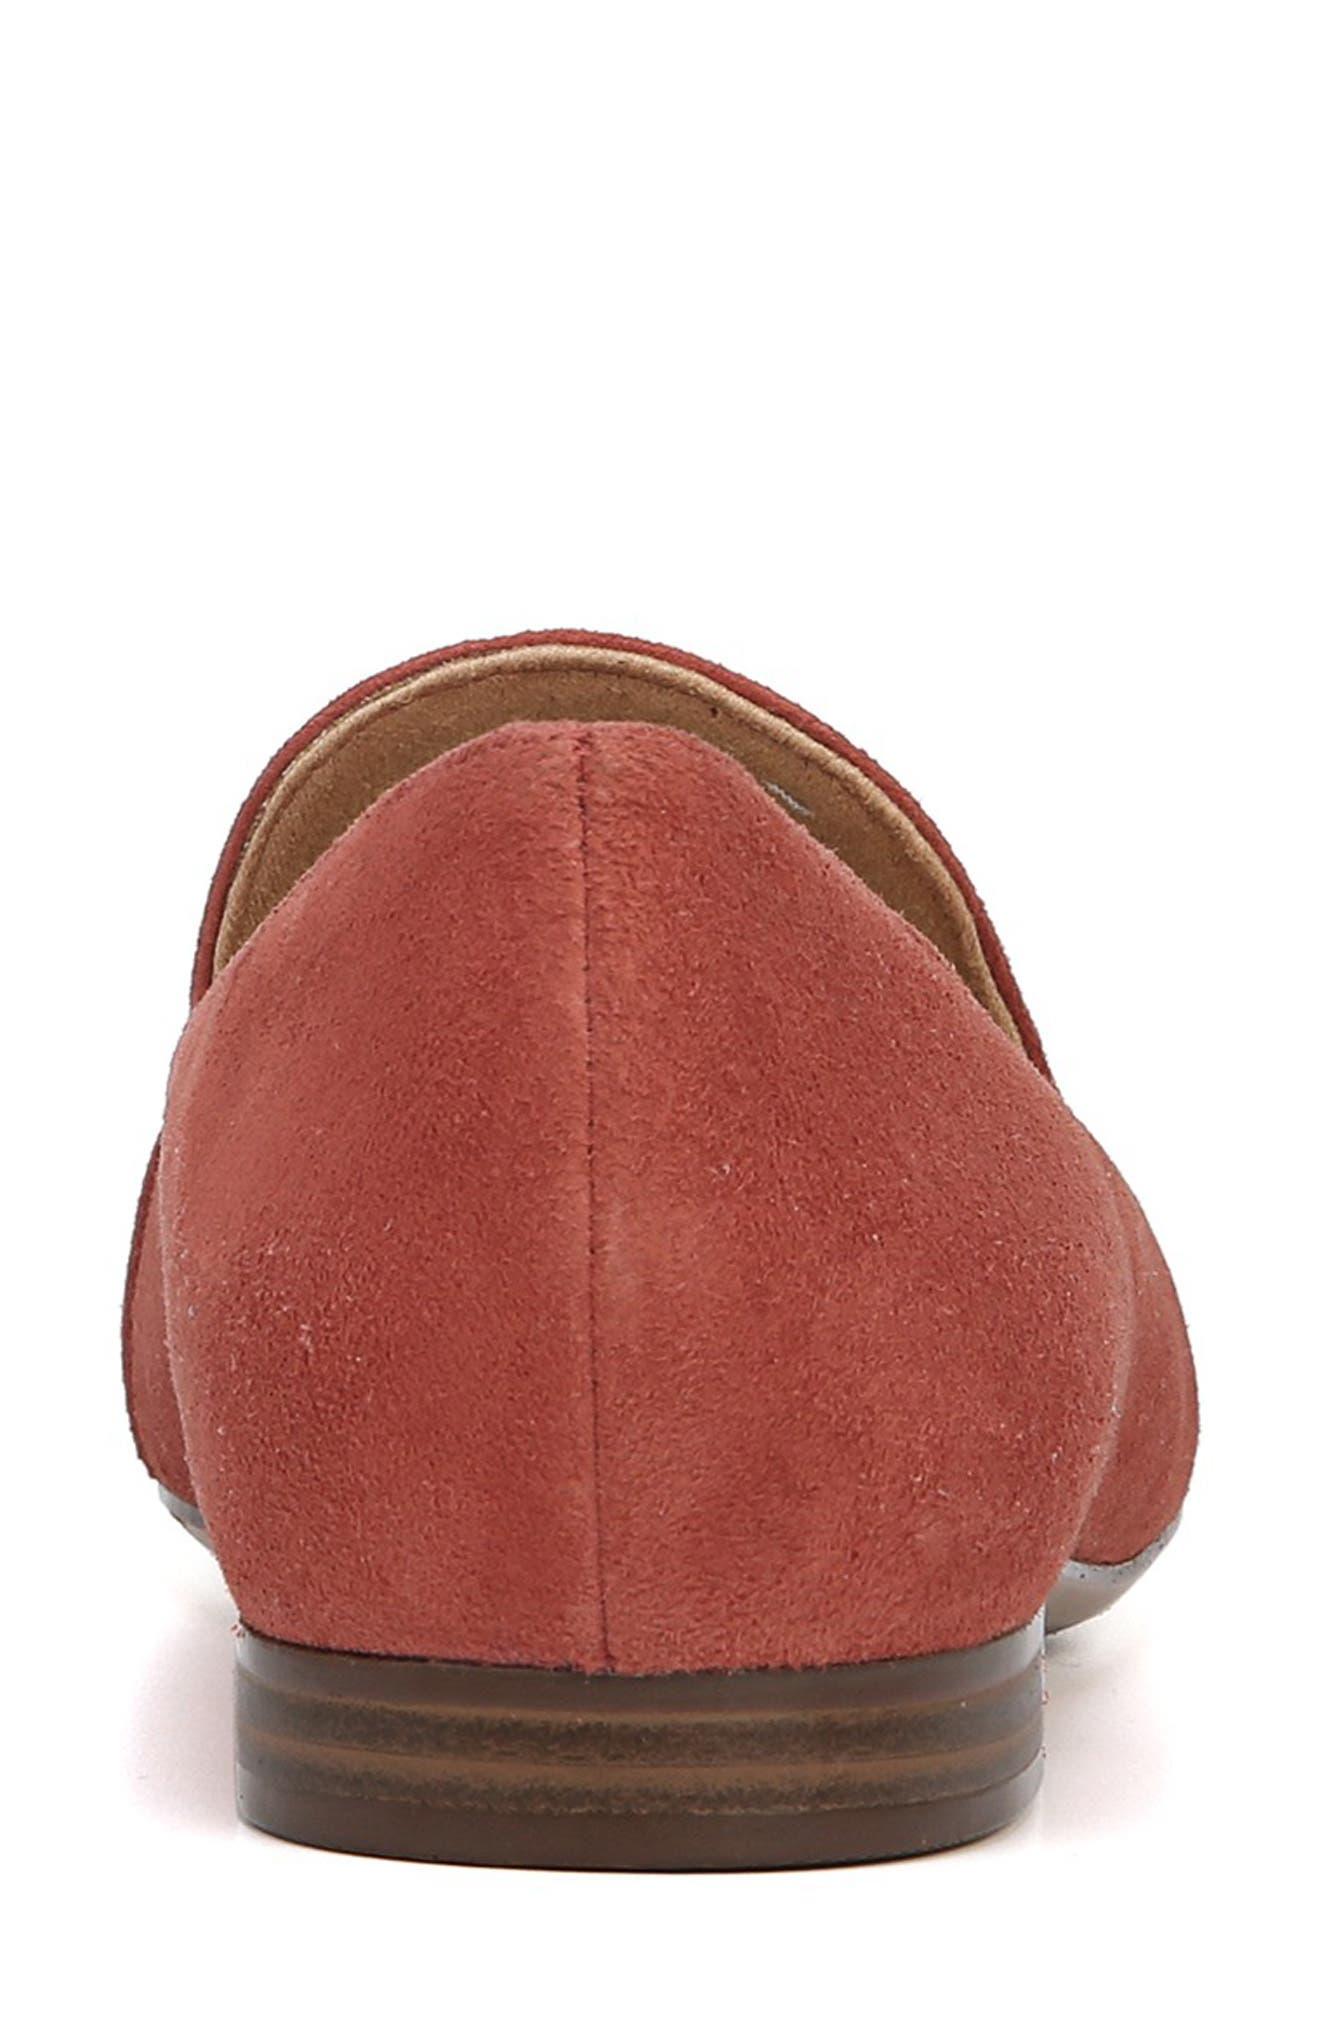 Emiline Flat Loafer,                             Alternate thumbnail 7, color,                             DESERT CLAY SUEDE